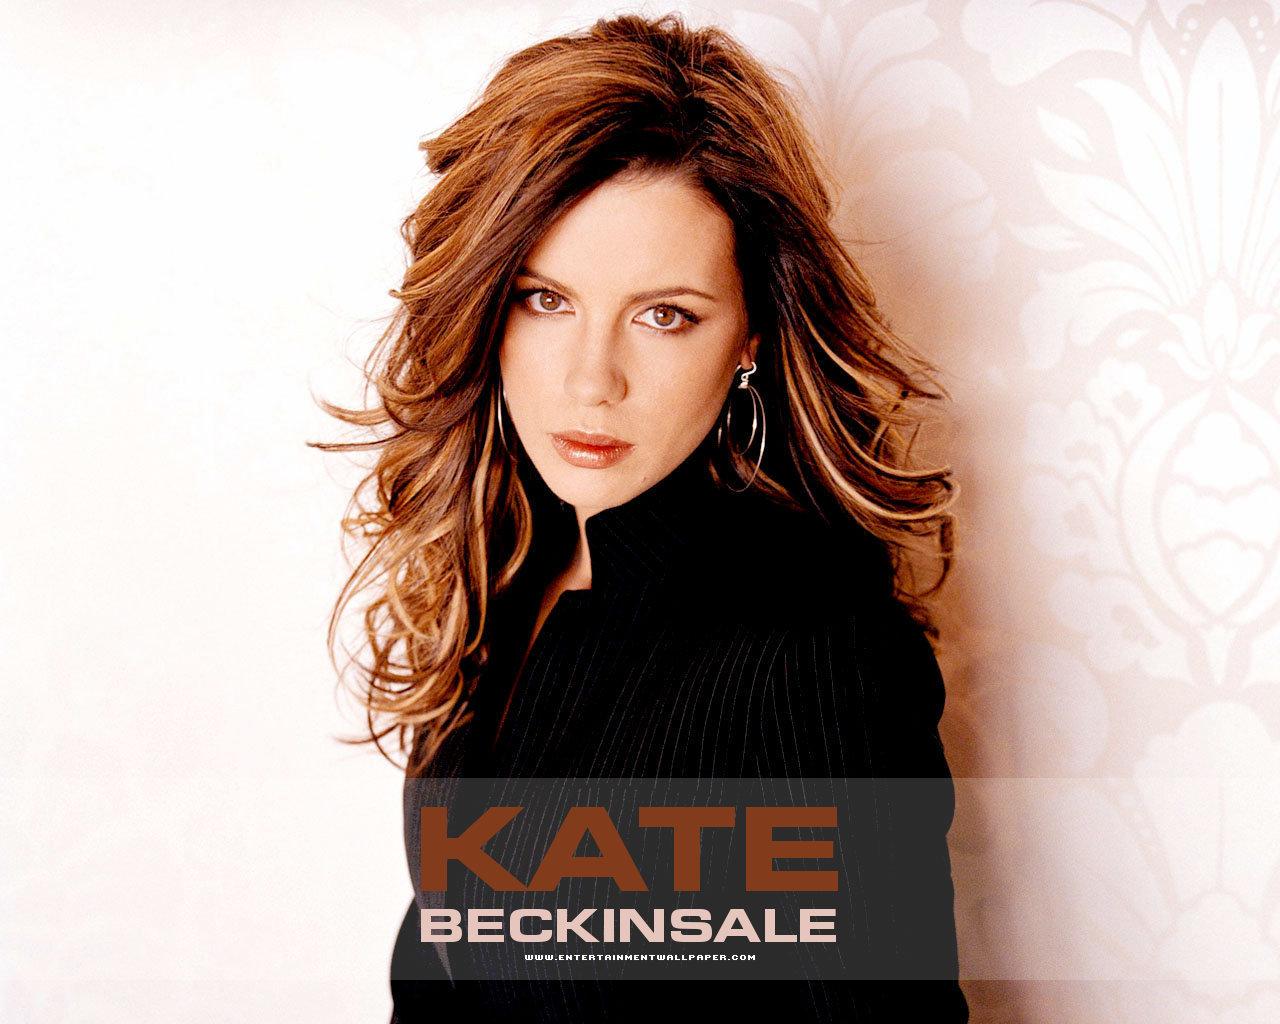 Kate kate beckinsale